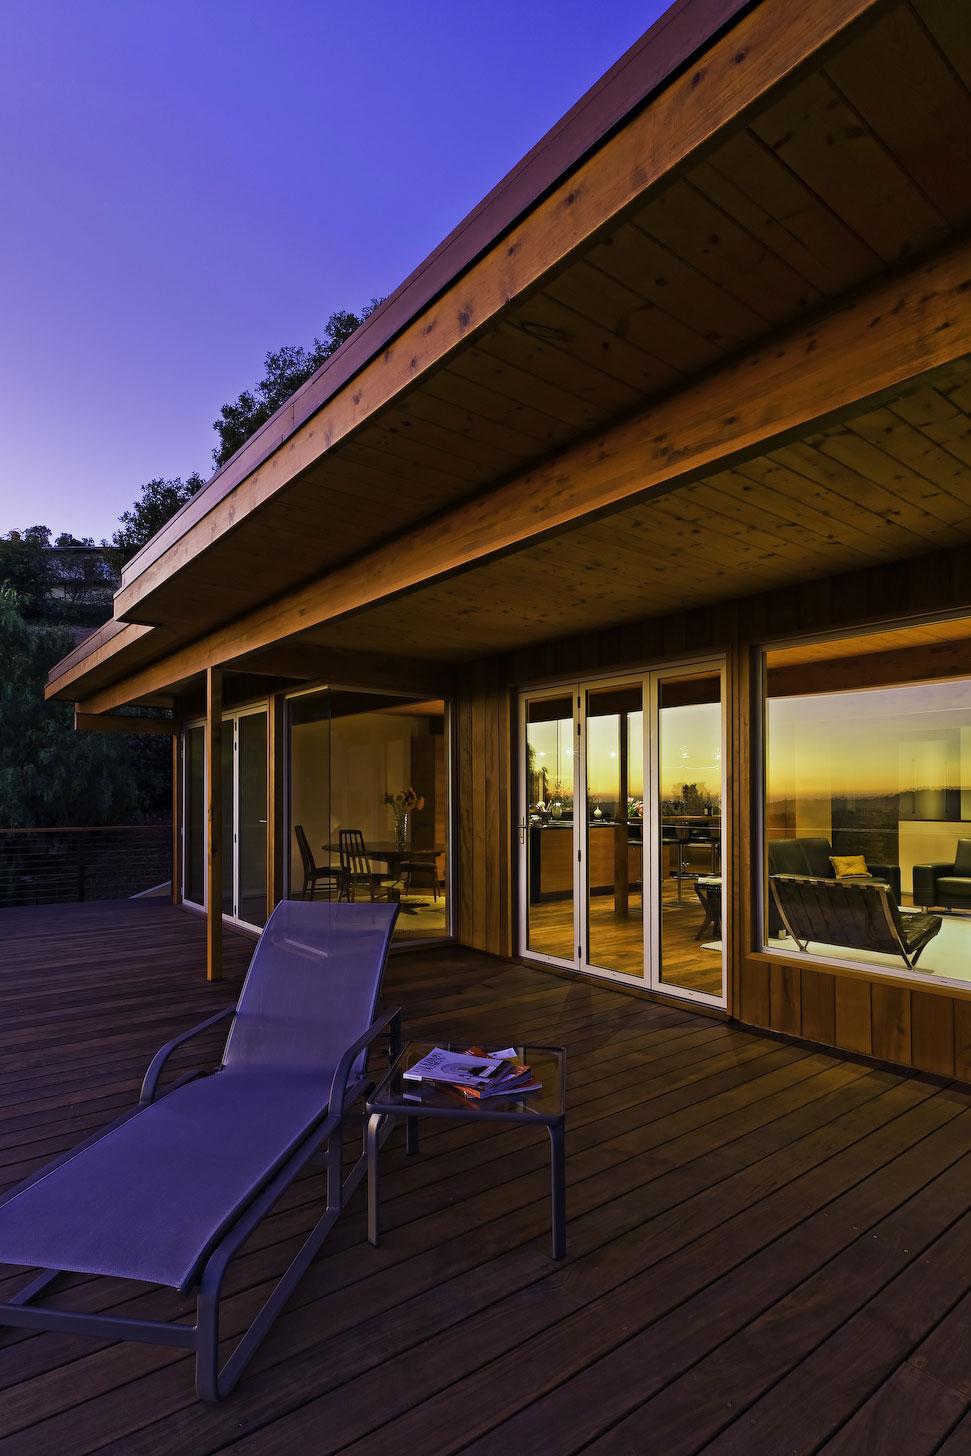 Patio Doors, Wooden Balcony, Mid-Century Modern Home in Santa Barbara, California